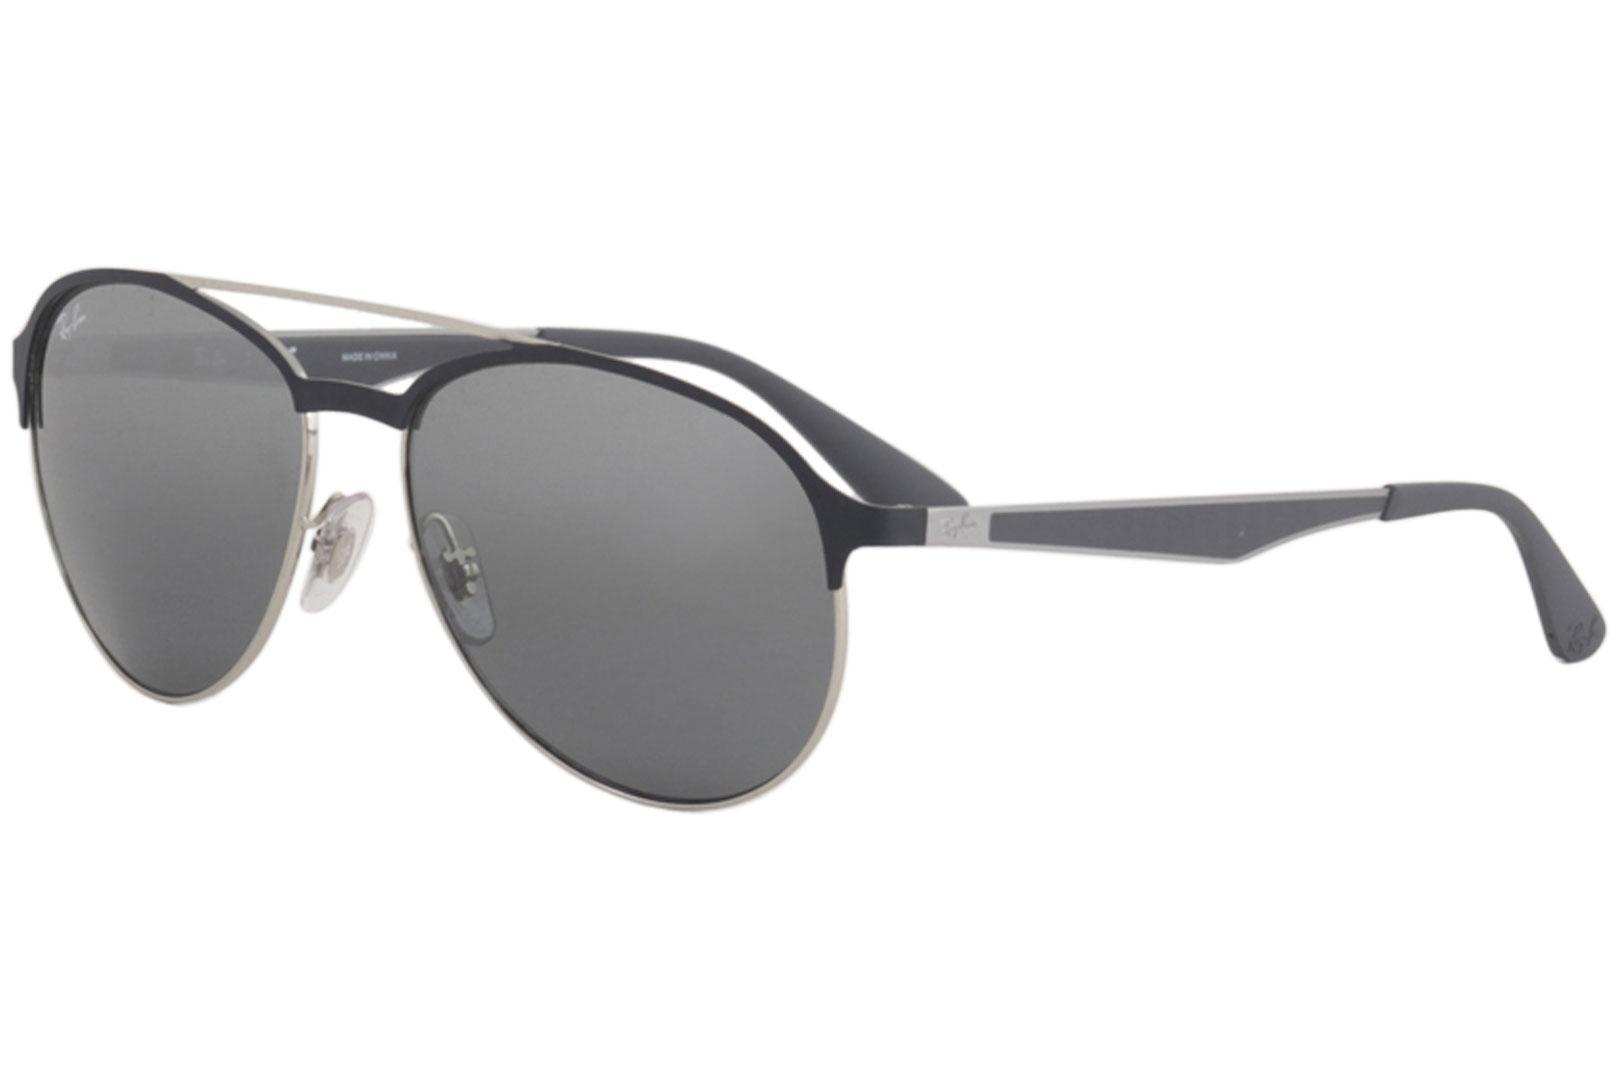 eca7ee07c8094 Ray Ban Men s RB3606 RB 3606 RayBan Fashion Pilot Sunglasses